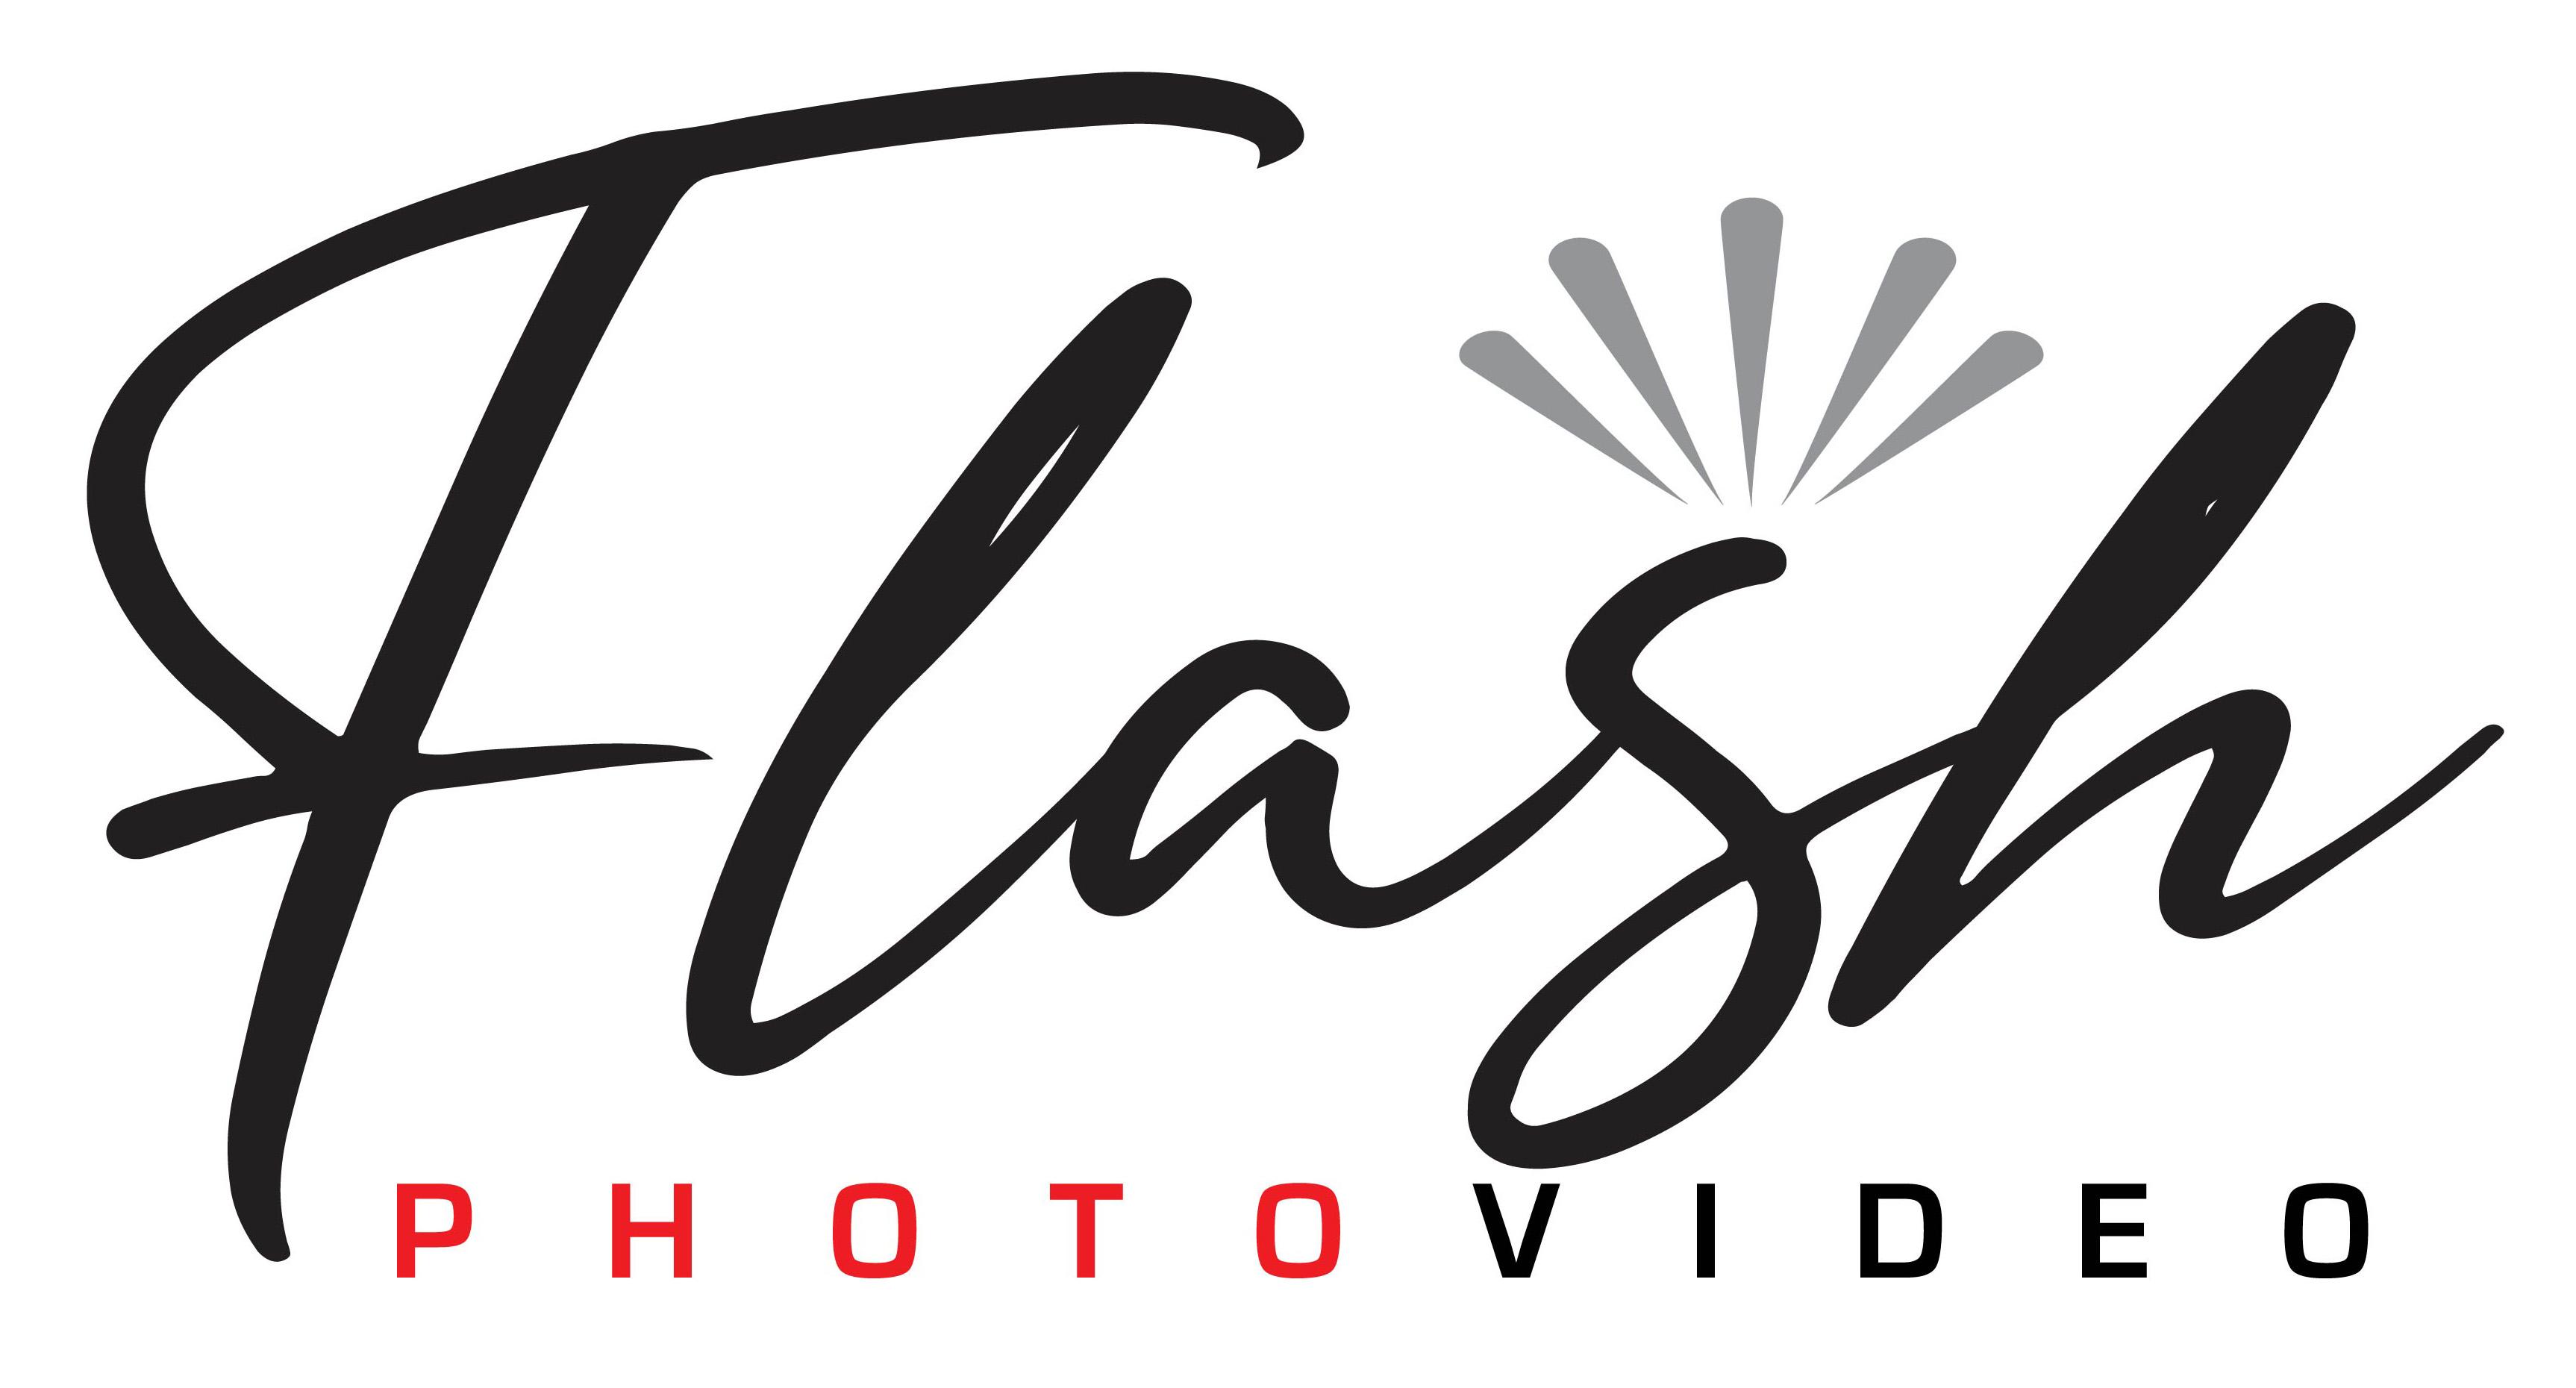 Flash PhotoVideo